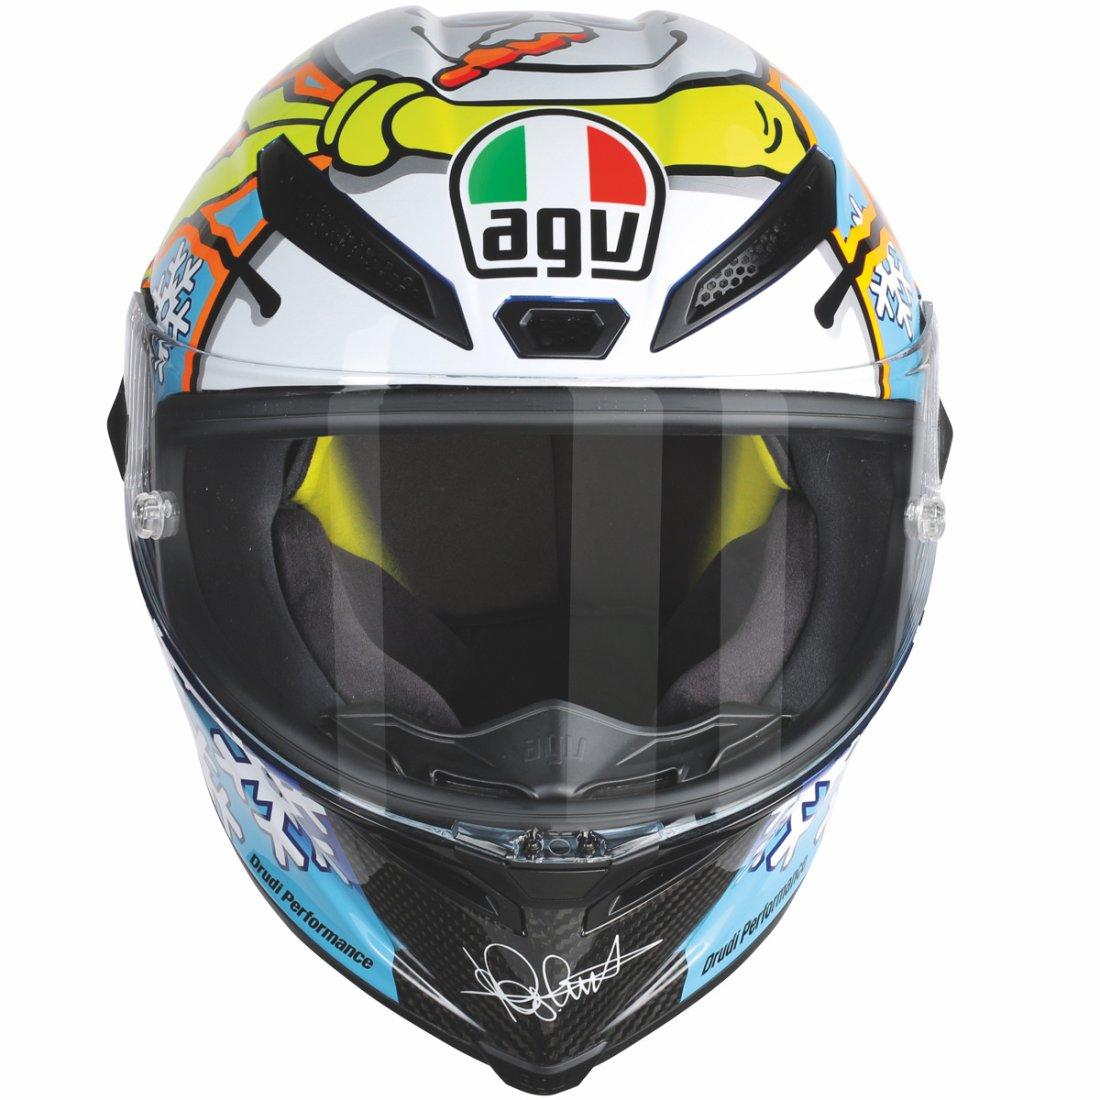 agv pista gp pinlock rossi winter test 2016 limited edition helmet motocard. Black Bedroom Furniture Sets. Home Design Ideas